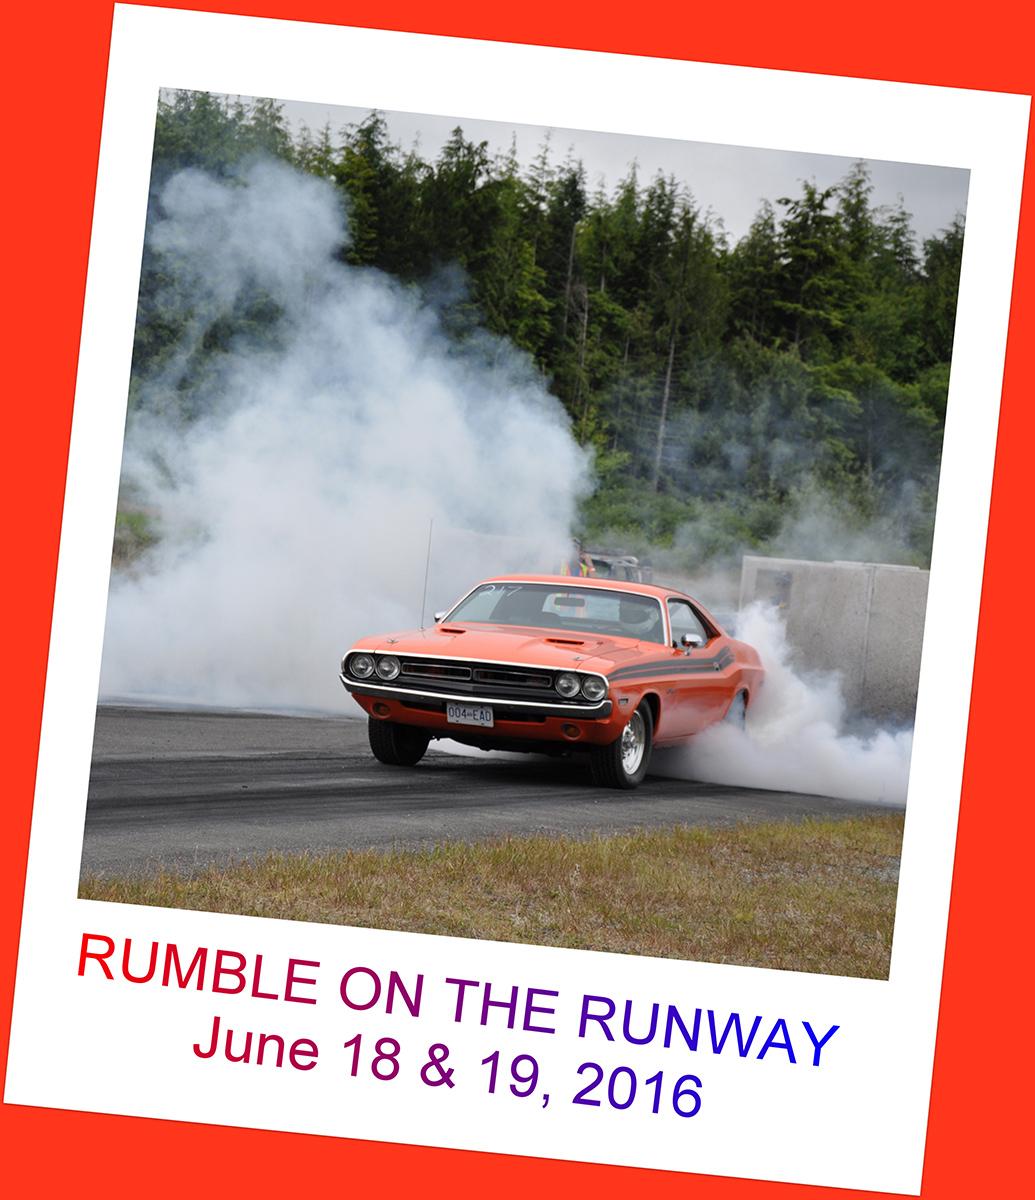 Rumble on the Runway June 18 & 19, 2016 1091